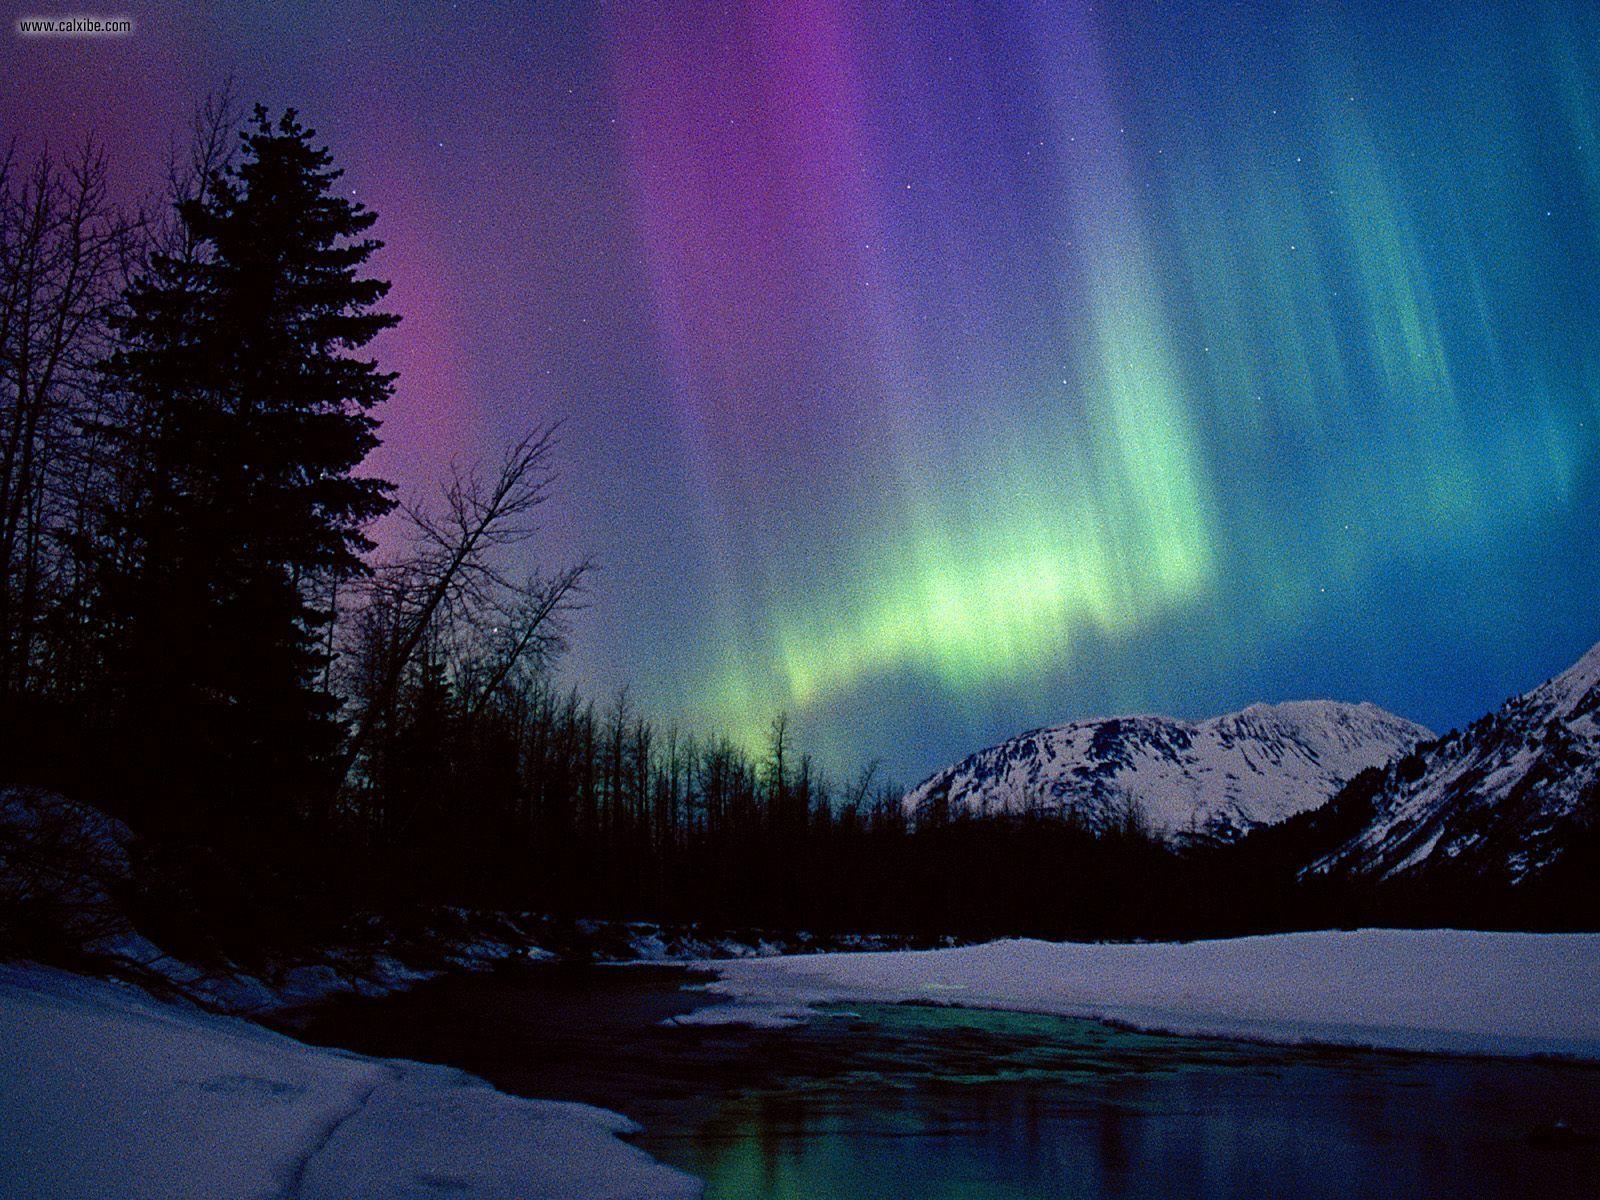 Northern Lights Wallpaper 1600x1200 Northern Lights Over Portage 1600x1200